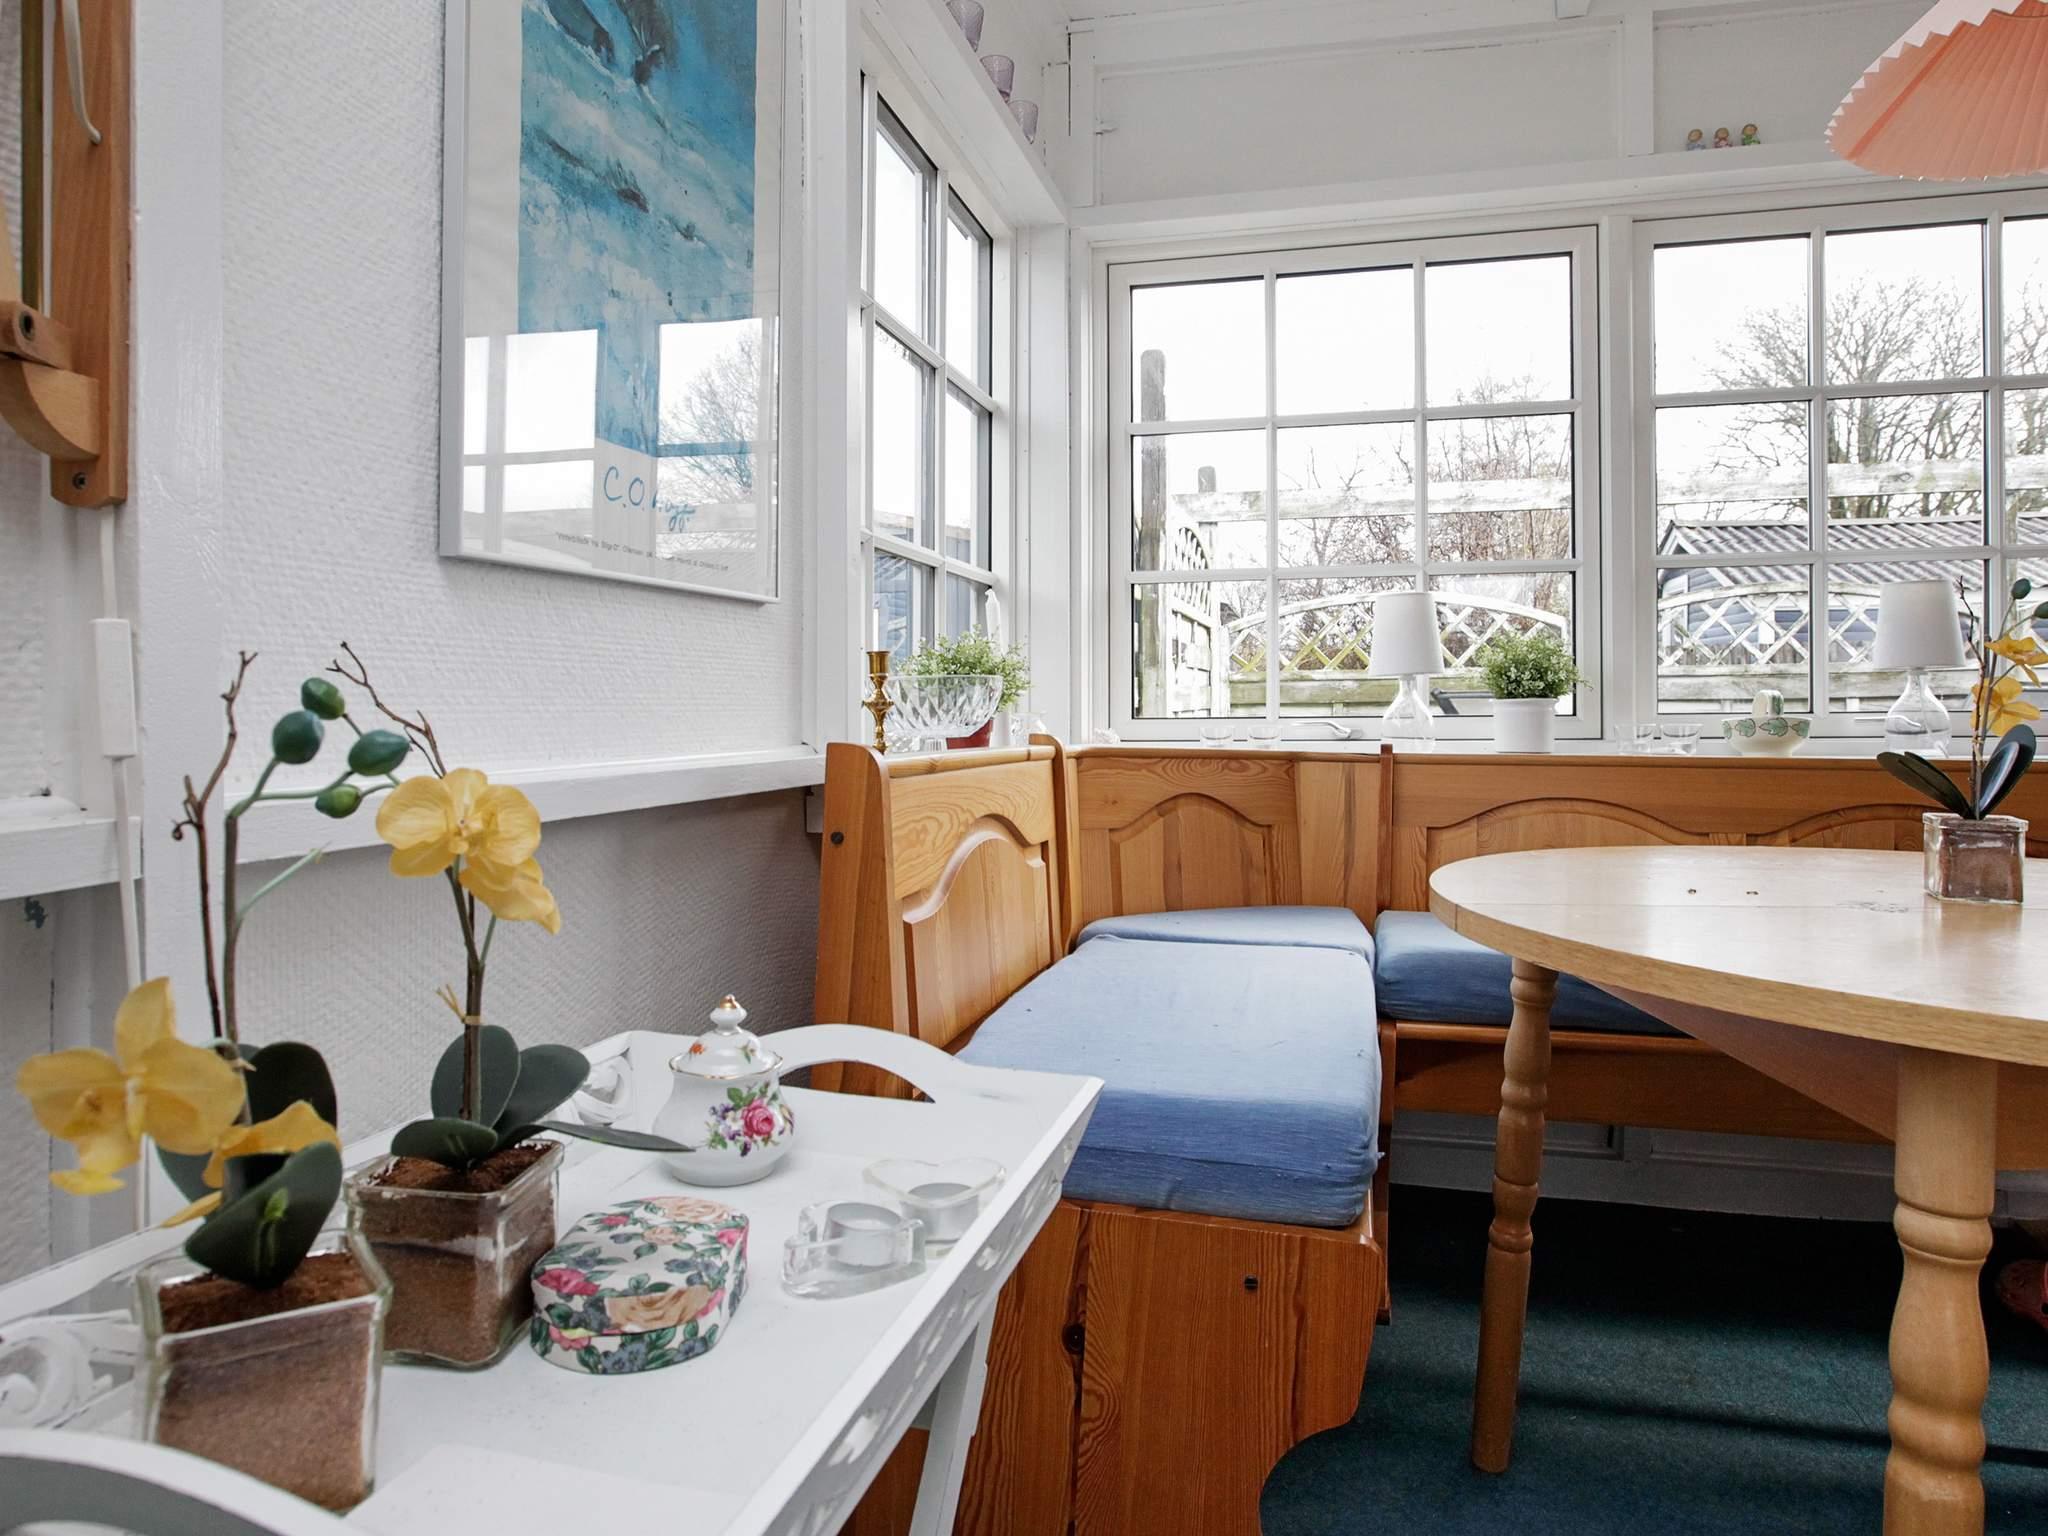 Maison de vacances Hasmark (1723417), Hasmark, , Fionie, Danemark, image 8